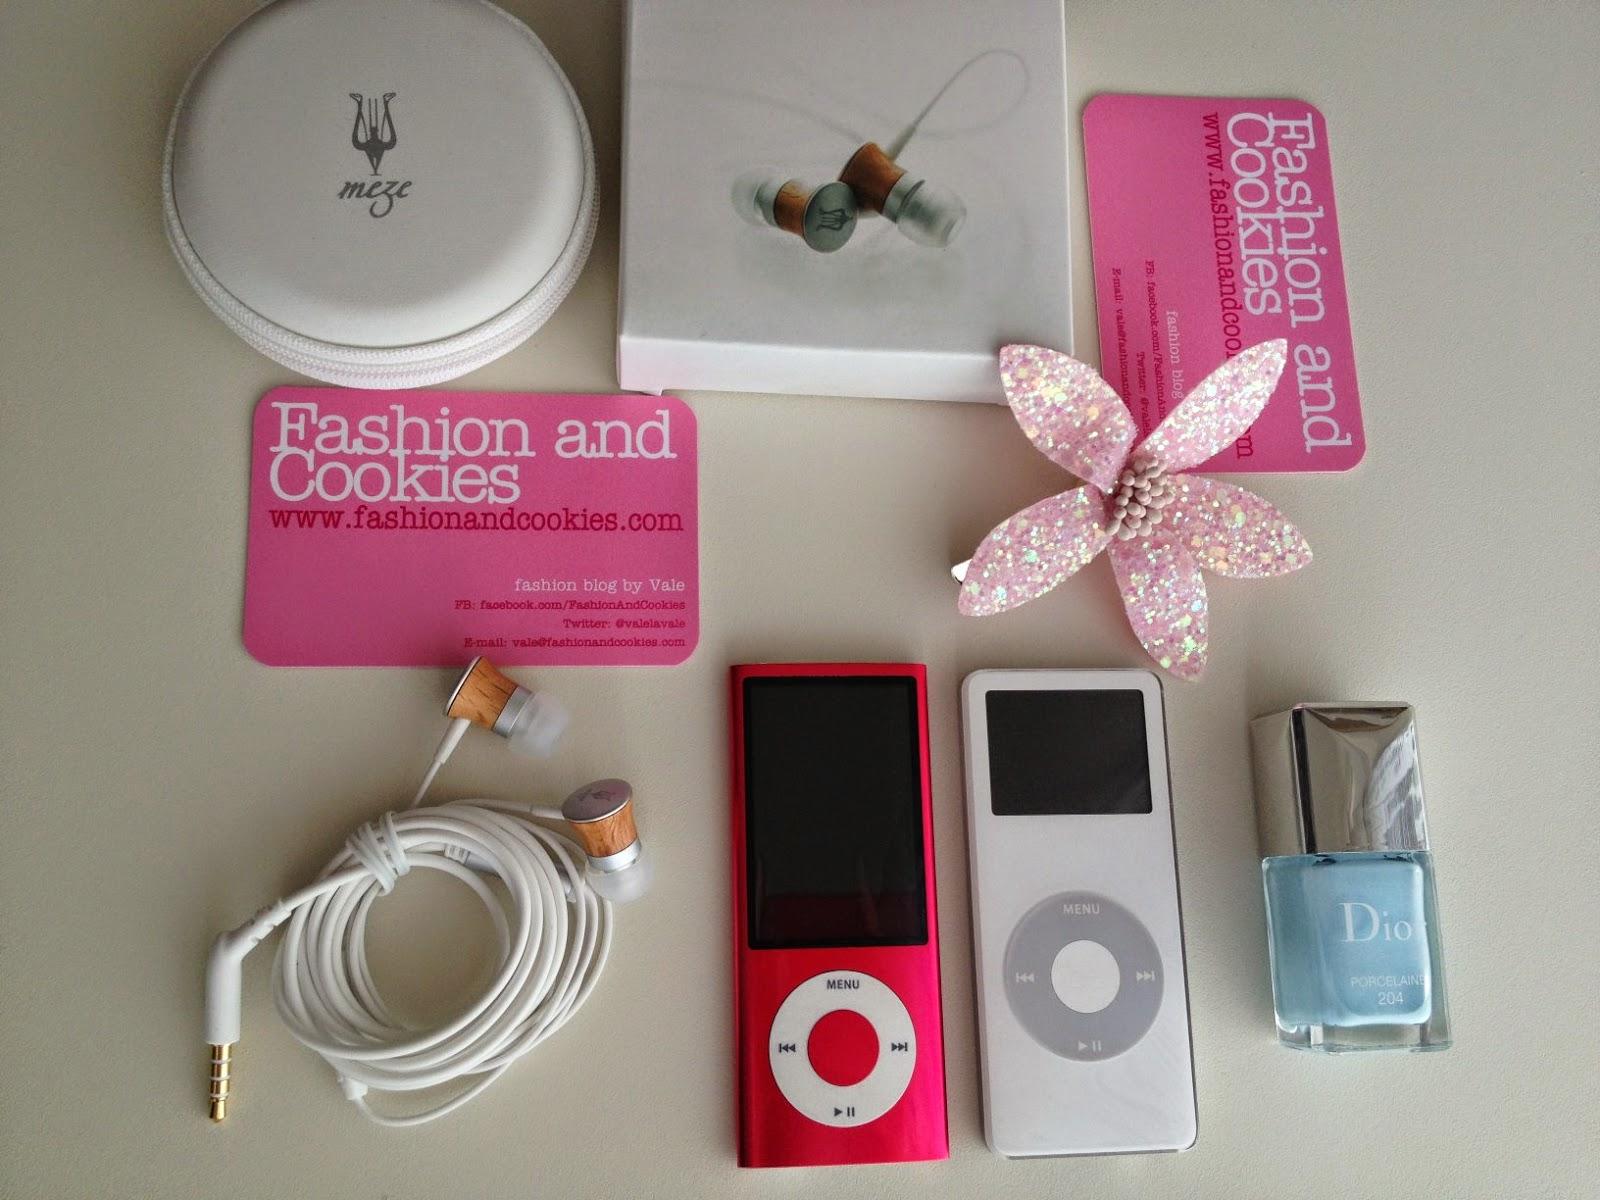 Meze 11 Deco, wood earphones, meze sound device review, Fashion and Cookies, fashion blogger